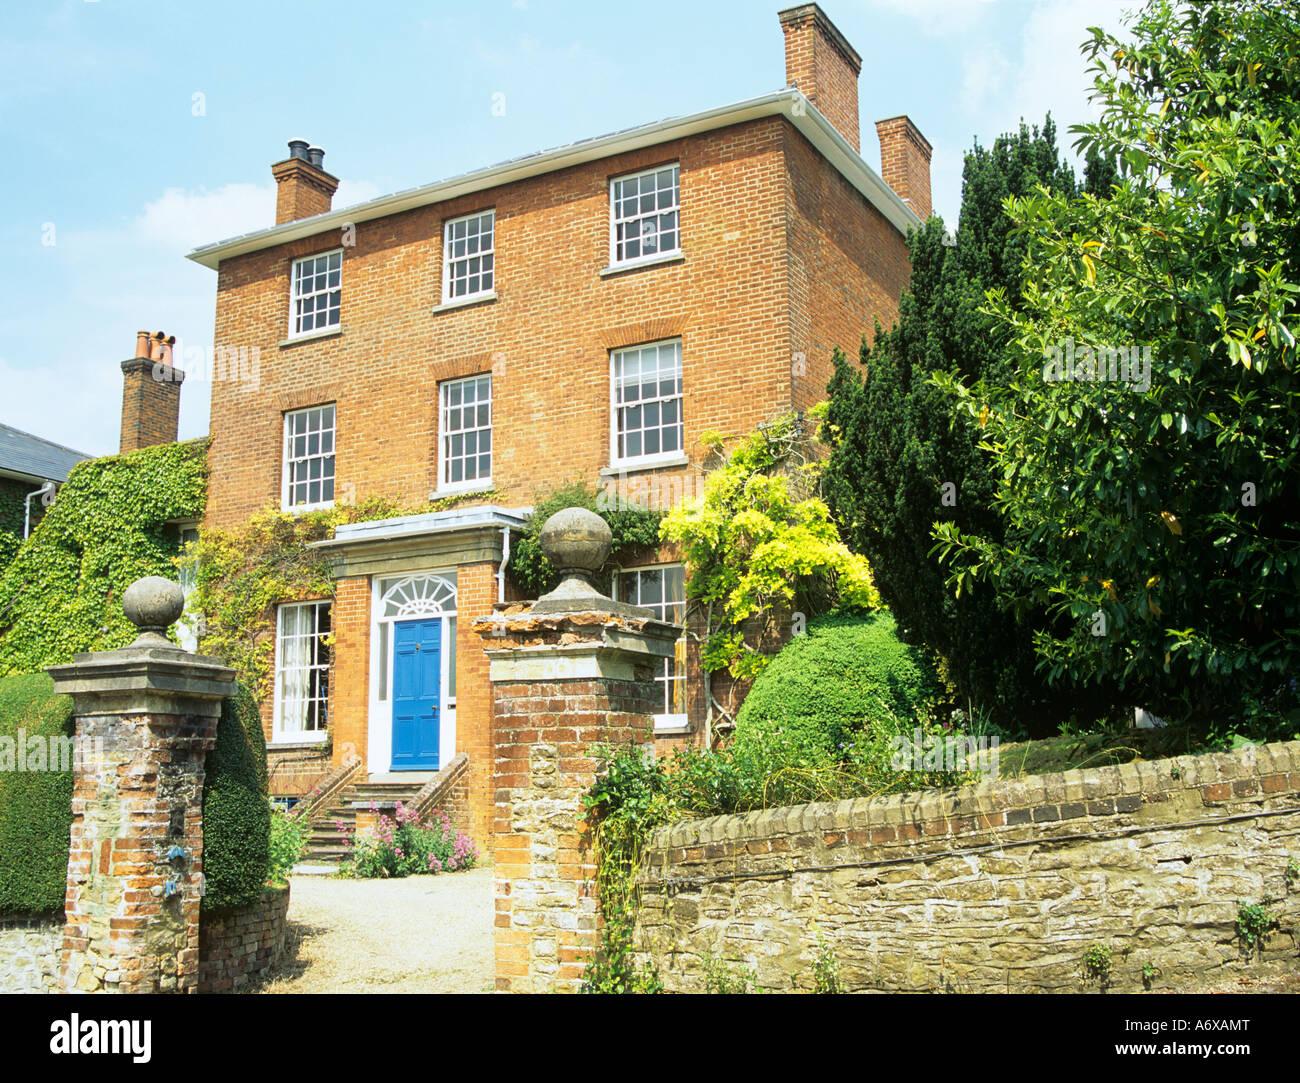 GUILDFORD SURREY UK June The former home of Lewis Carroll real name Rev Charles Dodgson - Stock Image